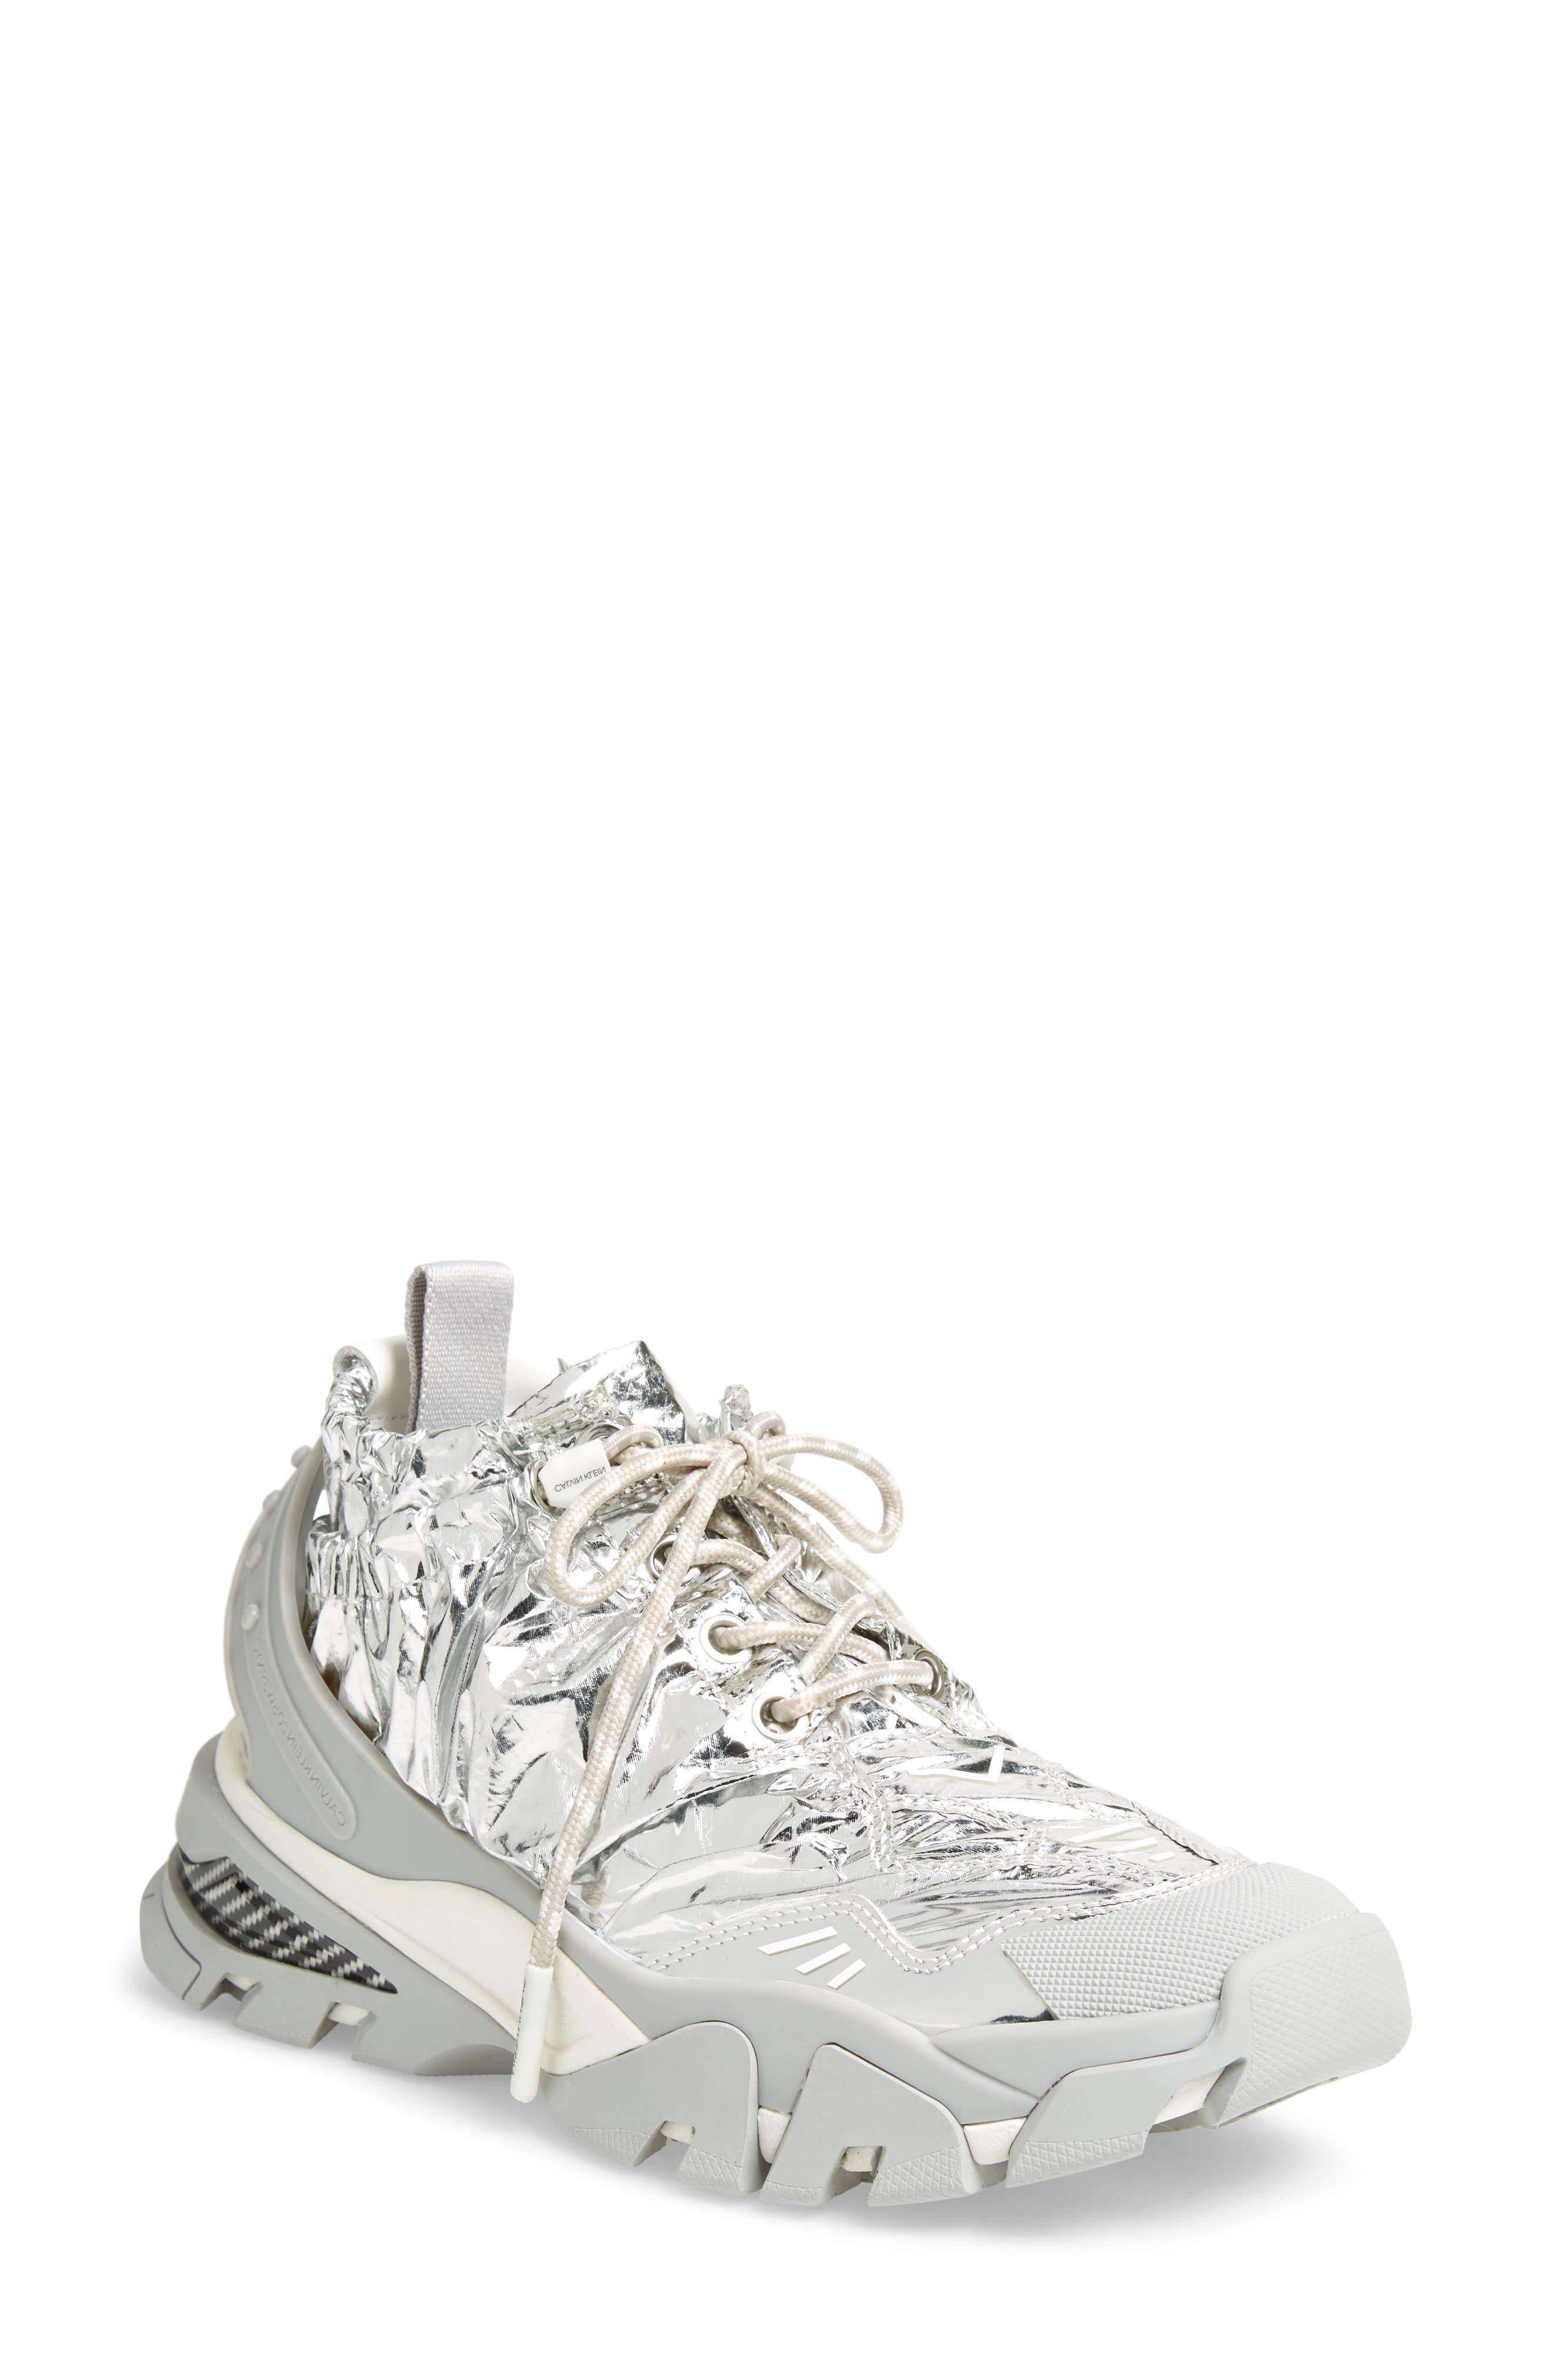 Caramene Sneaker,                             Main thumbnail 1, color,                             GREY/ WHITE